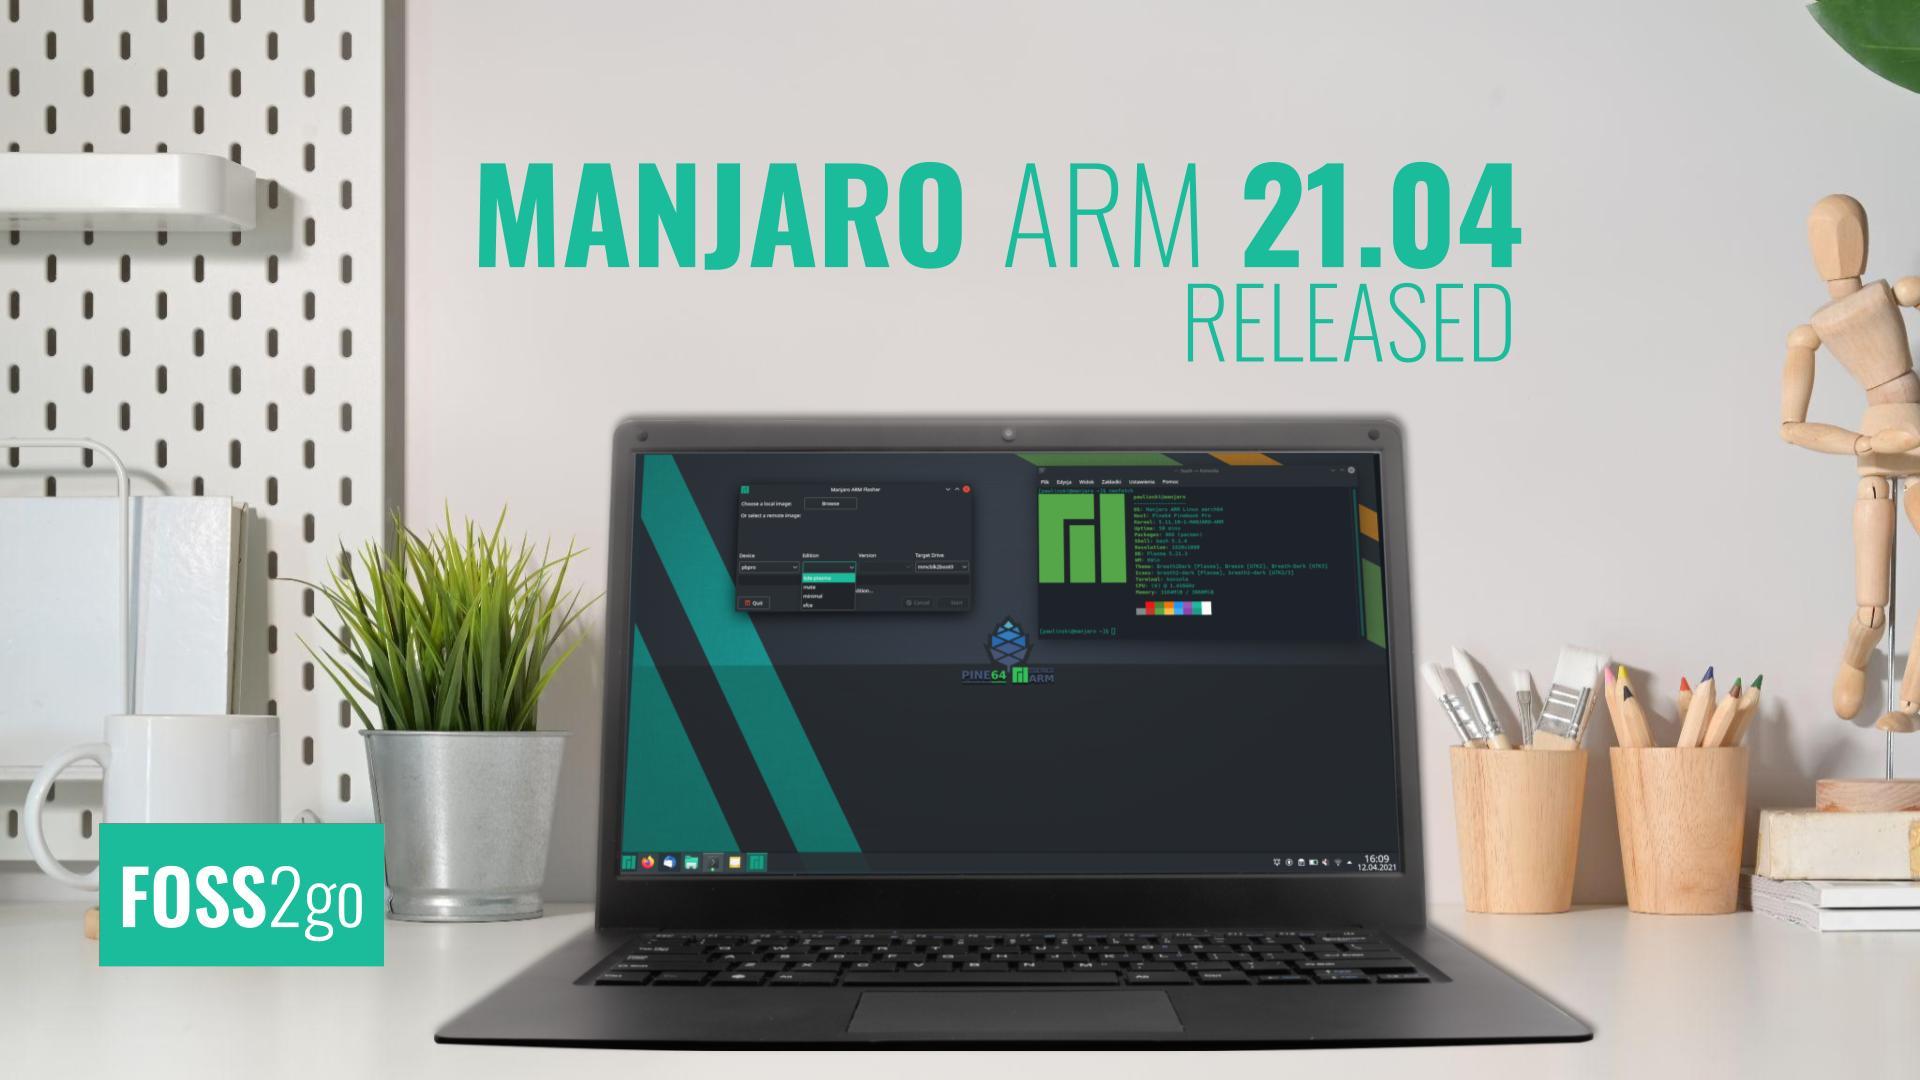 Manjaro ARM 21.04 released